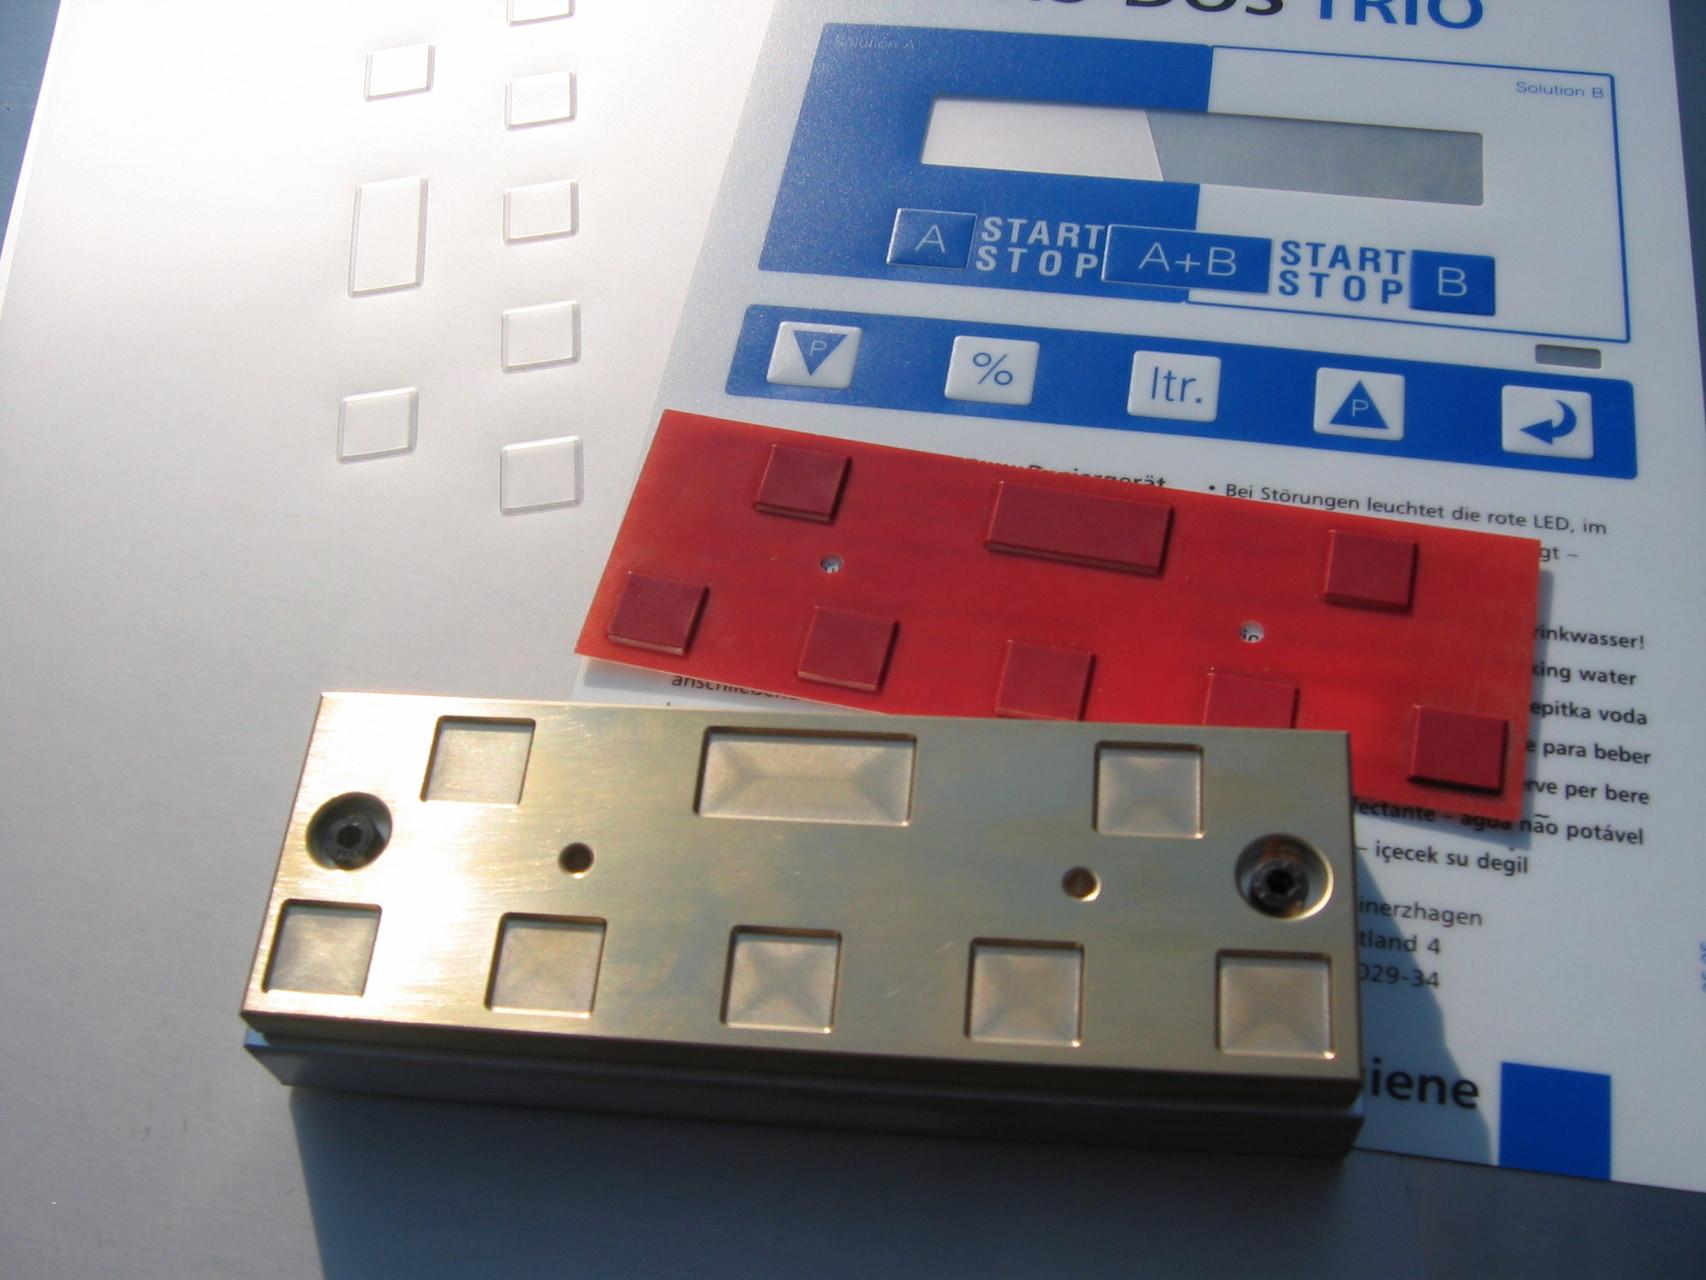 Blindprägestempel für Tastaturfolie